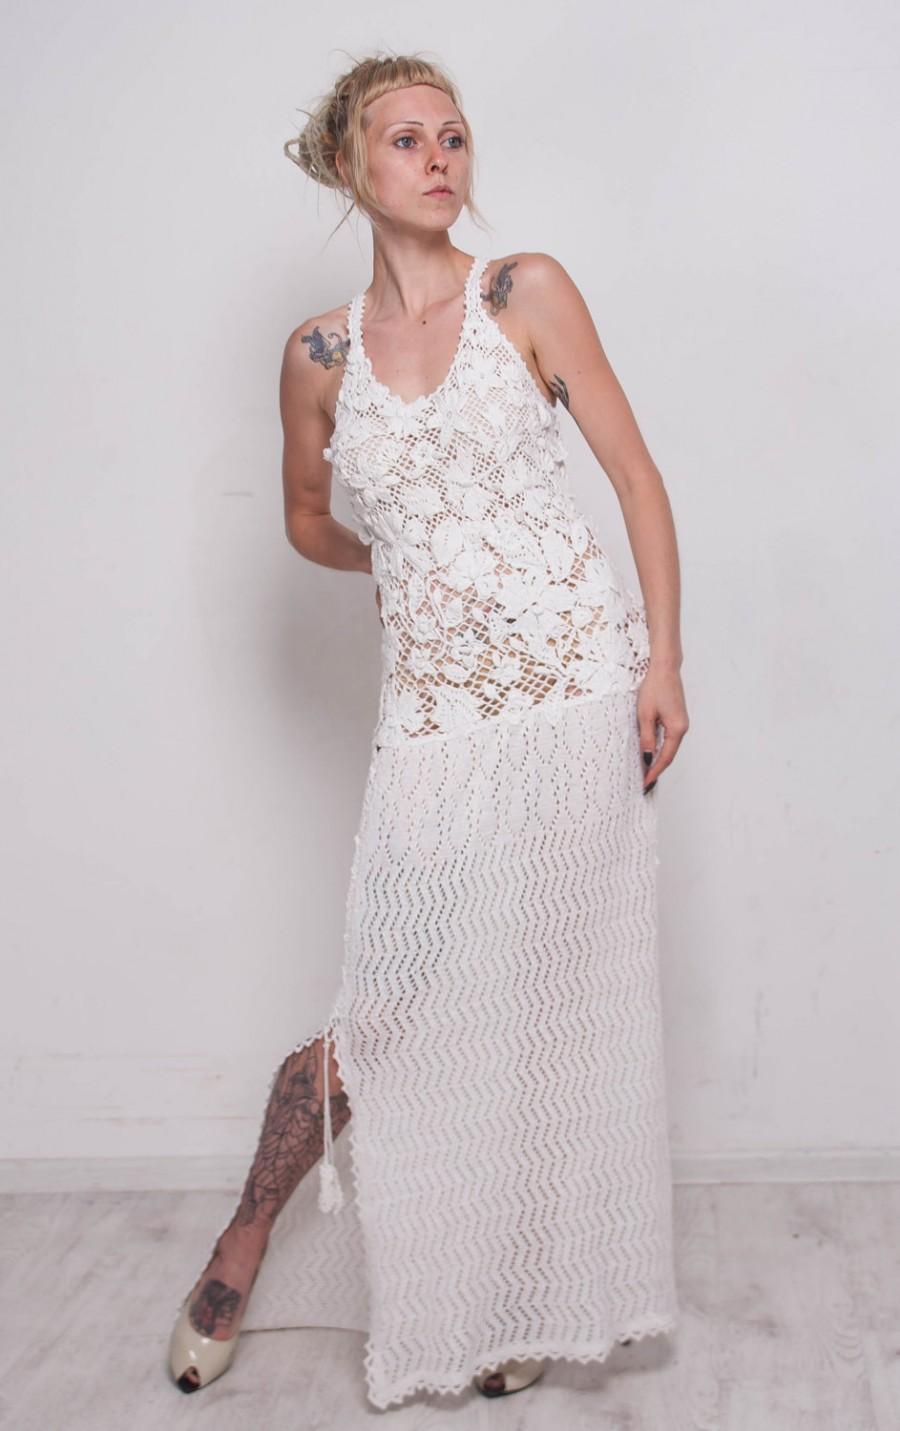 5ae97d9455fa Crochet white dress KNIT wedding Dress White Viscose Dress Maxi Dress  Crochet white Dress IVORY dress Beach White SunDress Bridal Maxi Dress